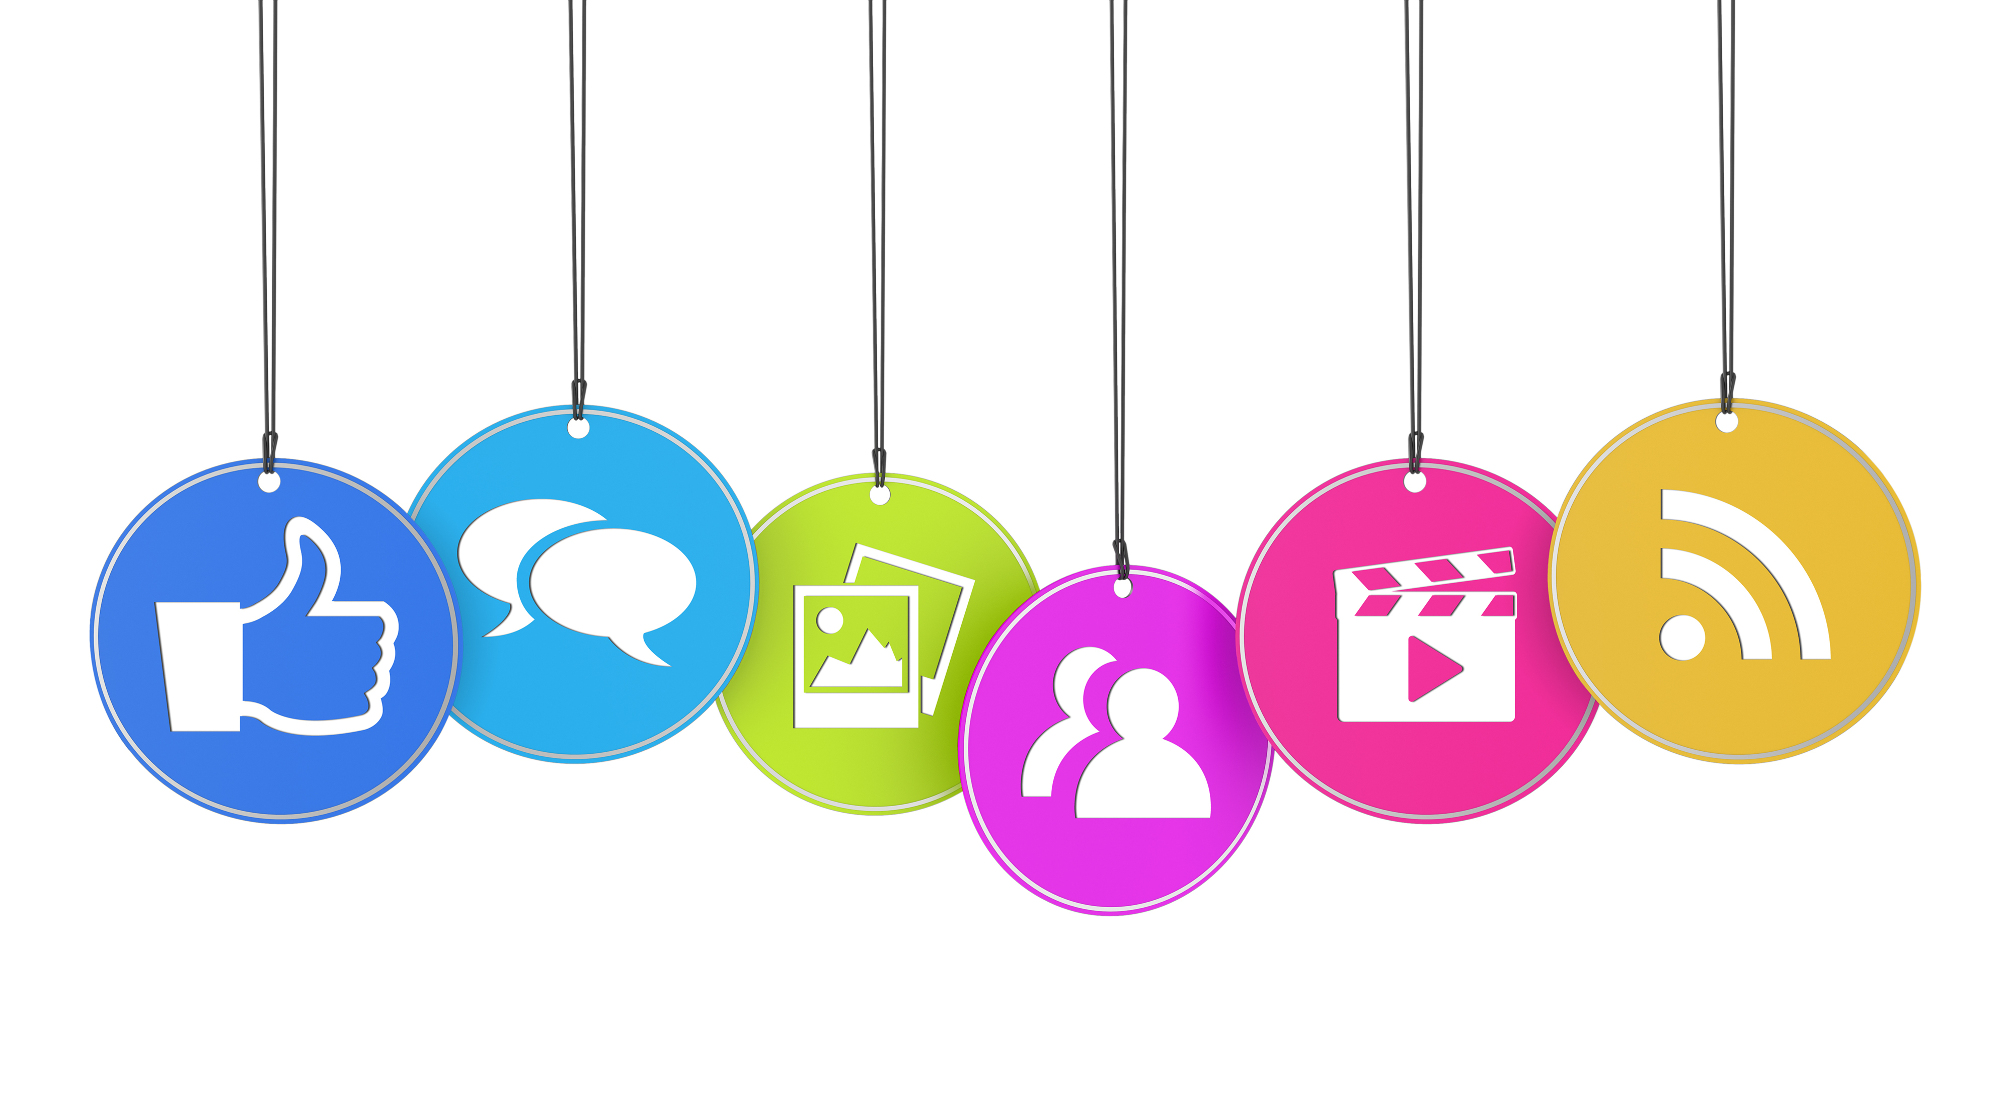 The Top 5 Updates To Social Media in 2015 (So Far)